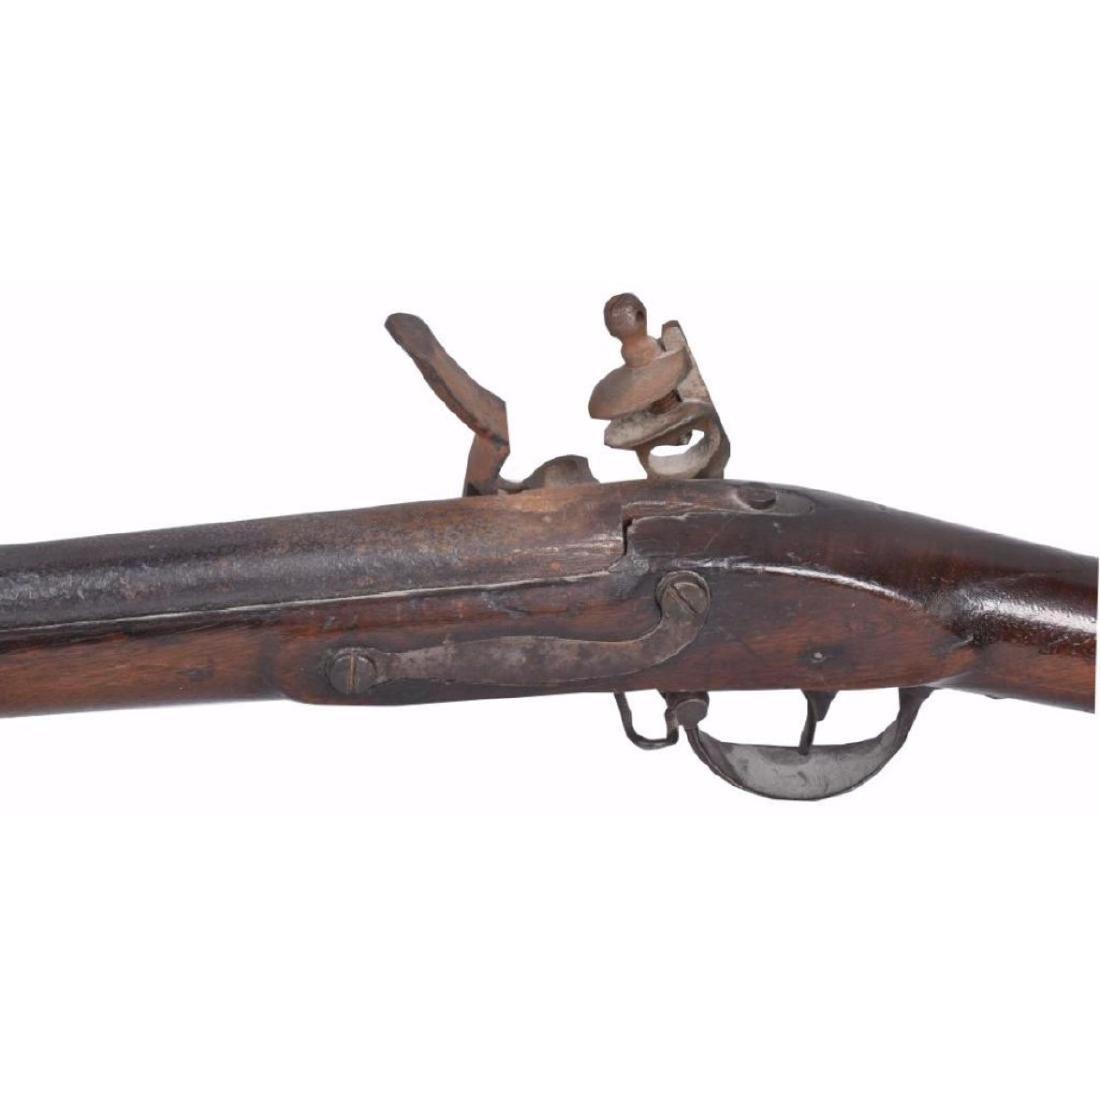 Rare U.S. 1816 HARPERS FERRY .69 caliber MUSKET - 5